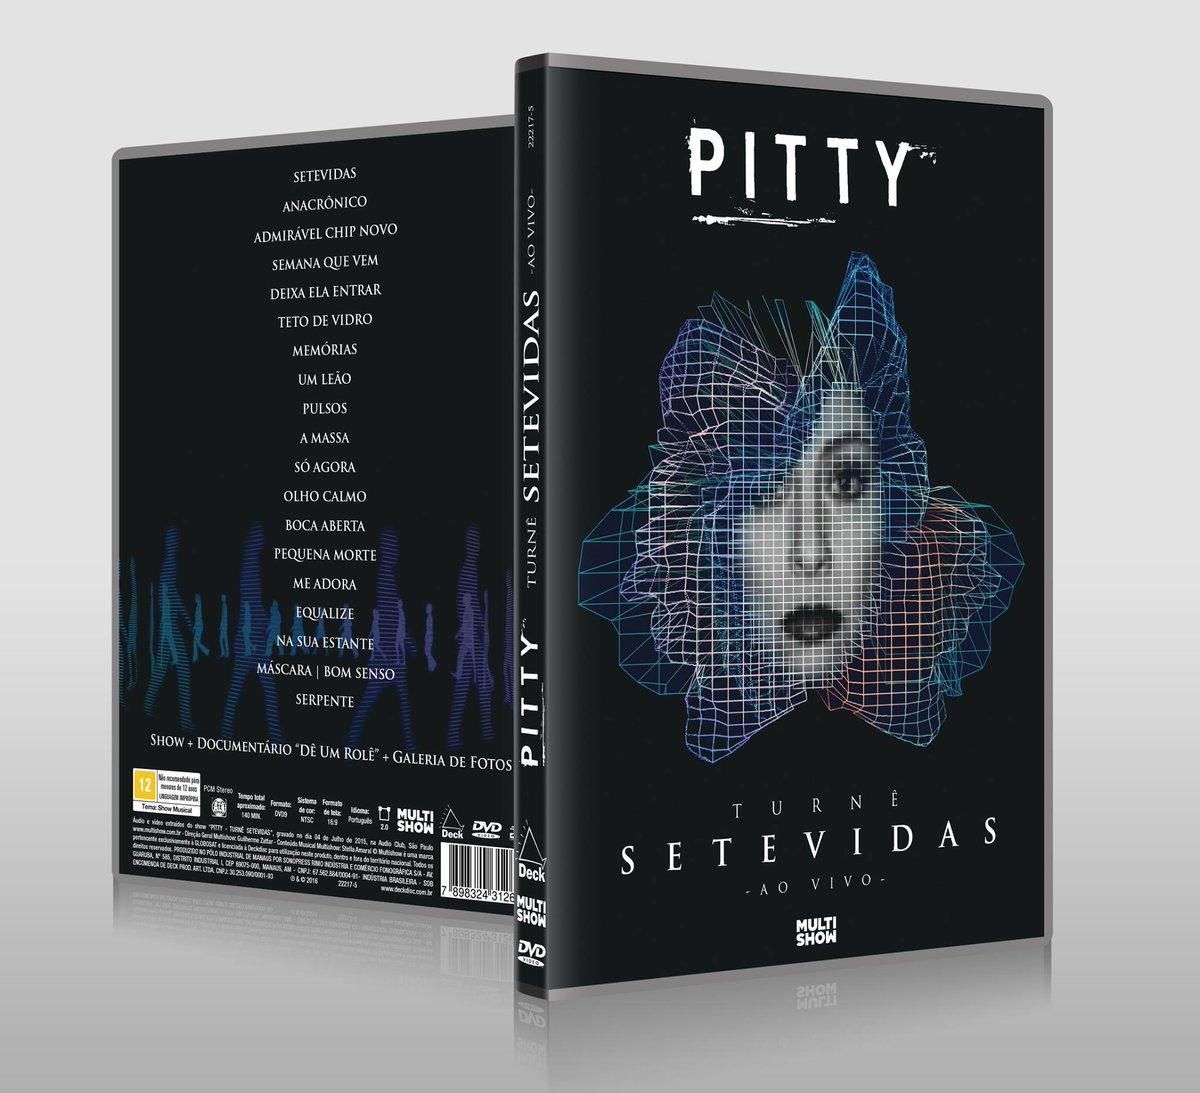 ".@Pitty divulga a capa do novo DVD ""Turnê SETEVIDAS – Ao Vivo"". Veja mais >> https://t.co/CxLIDzLUCd https://t.co/sDmzVkZDWV"